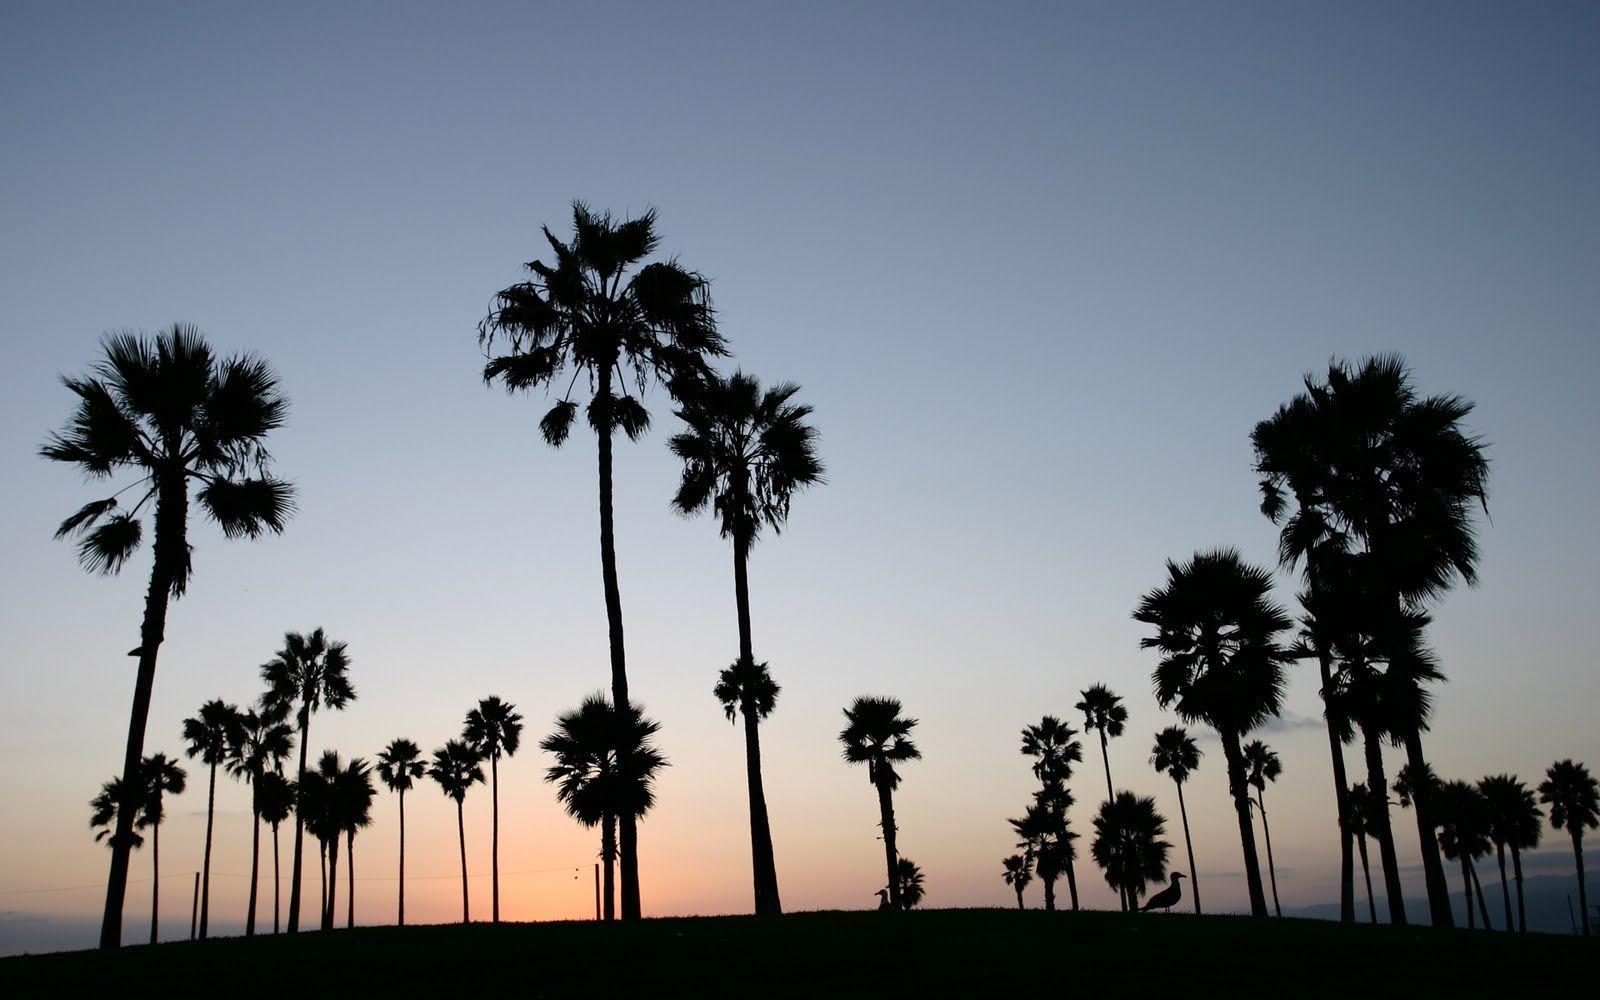 Venice Beach Palm Tree Silhouette Tree Silhouette Wallpaper Beach Wallpaper